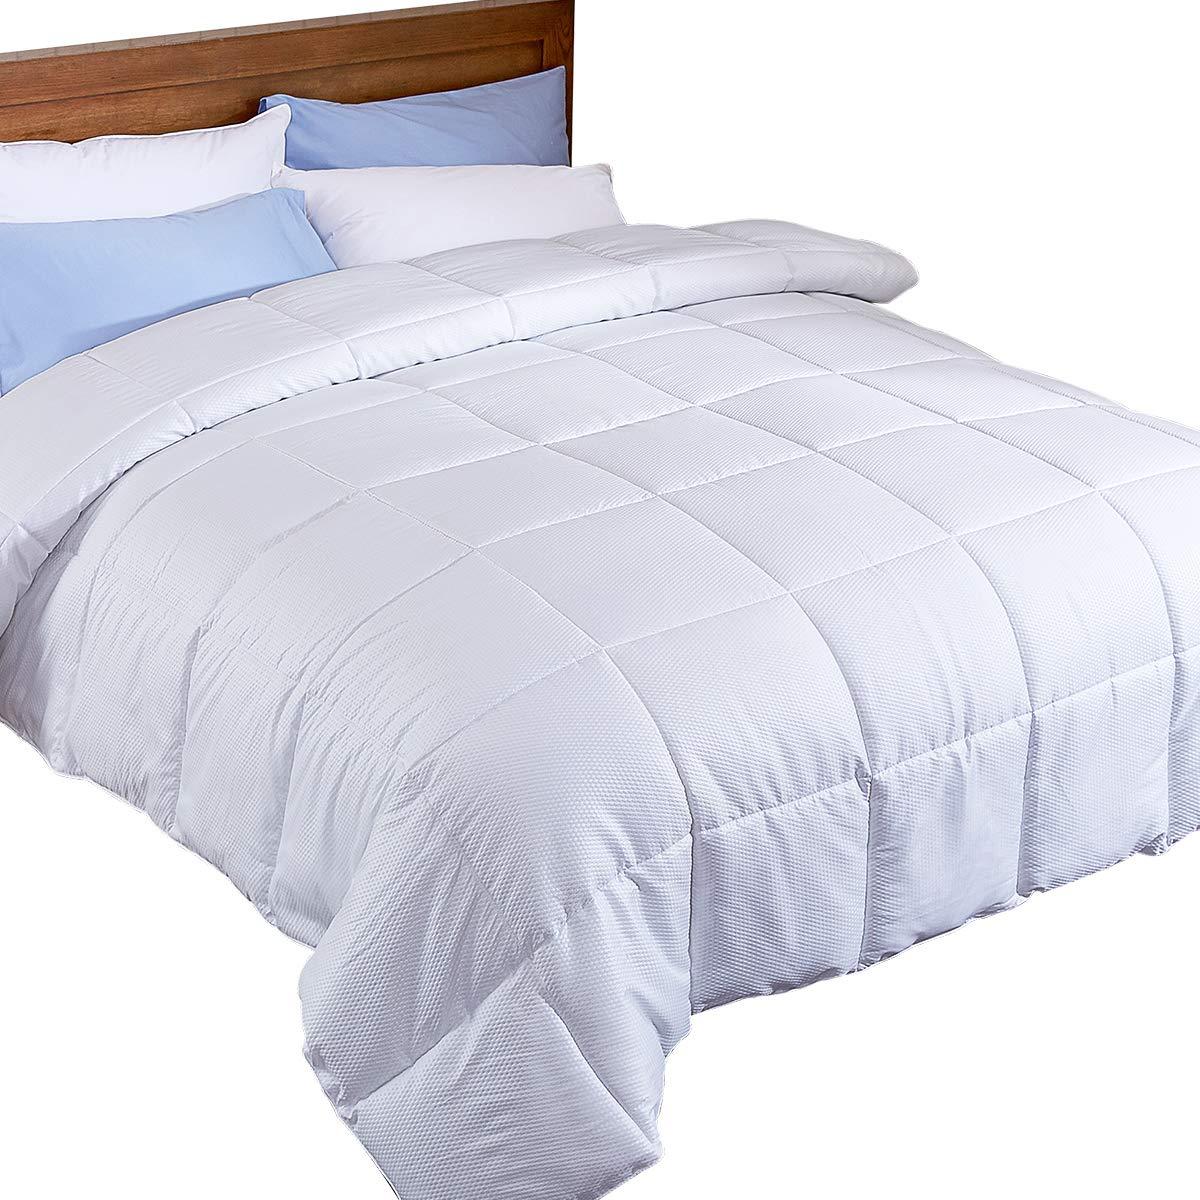 Puredown Alternative Comforter Lightweight White Duvet Insert, Peach Skin Fabric Size, Full/Queen PD-16025-F/Q